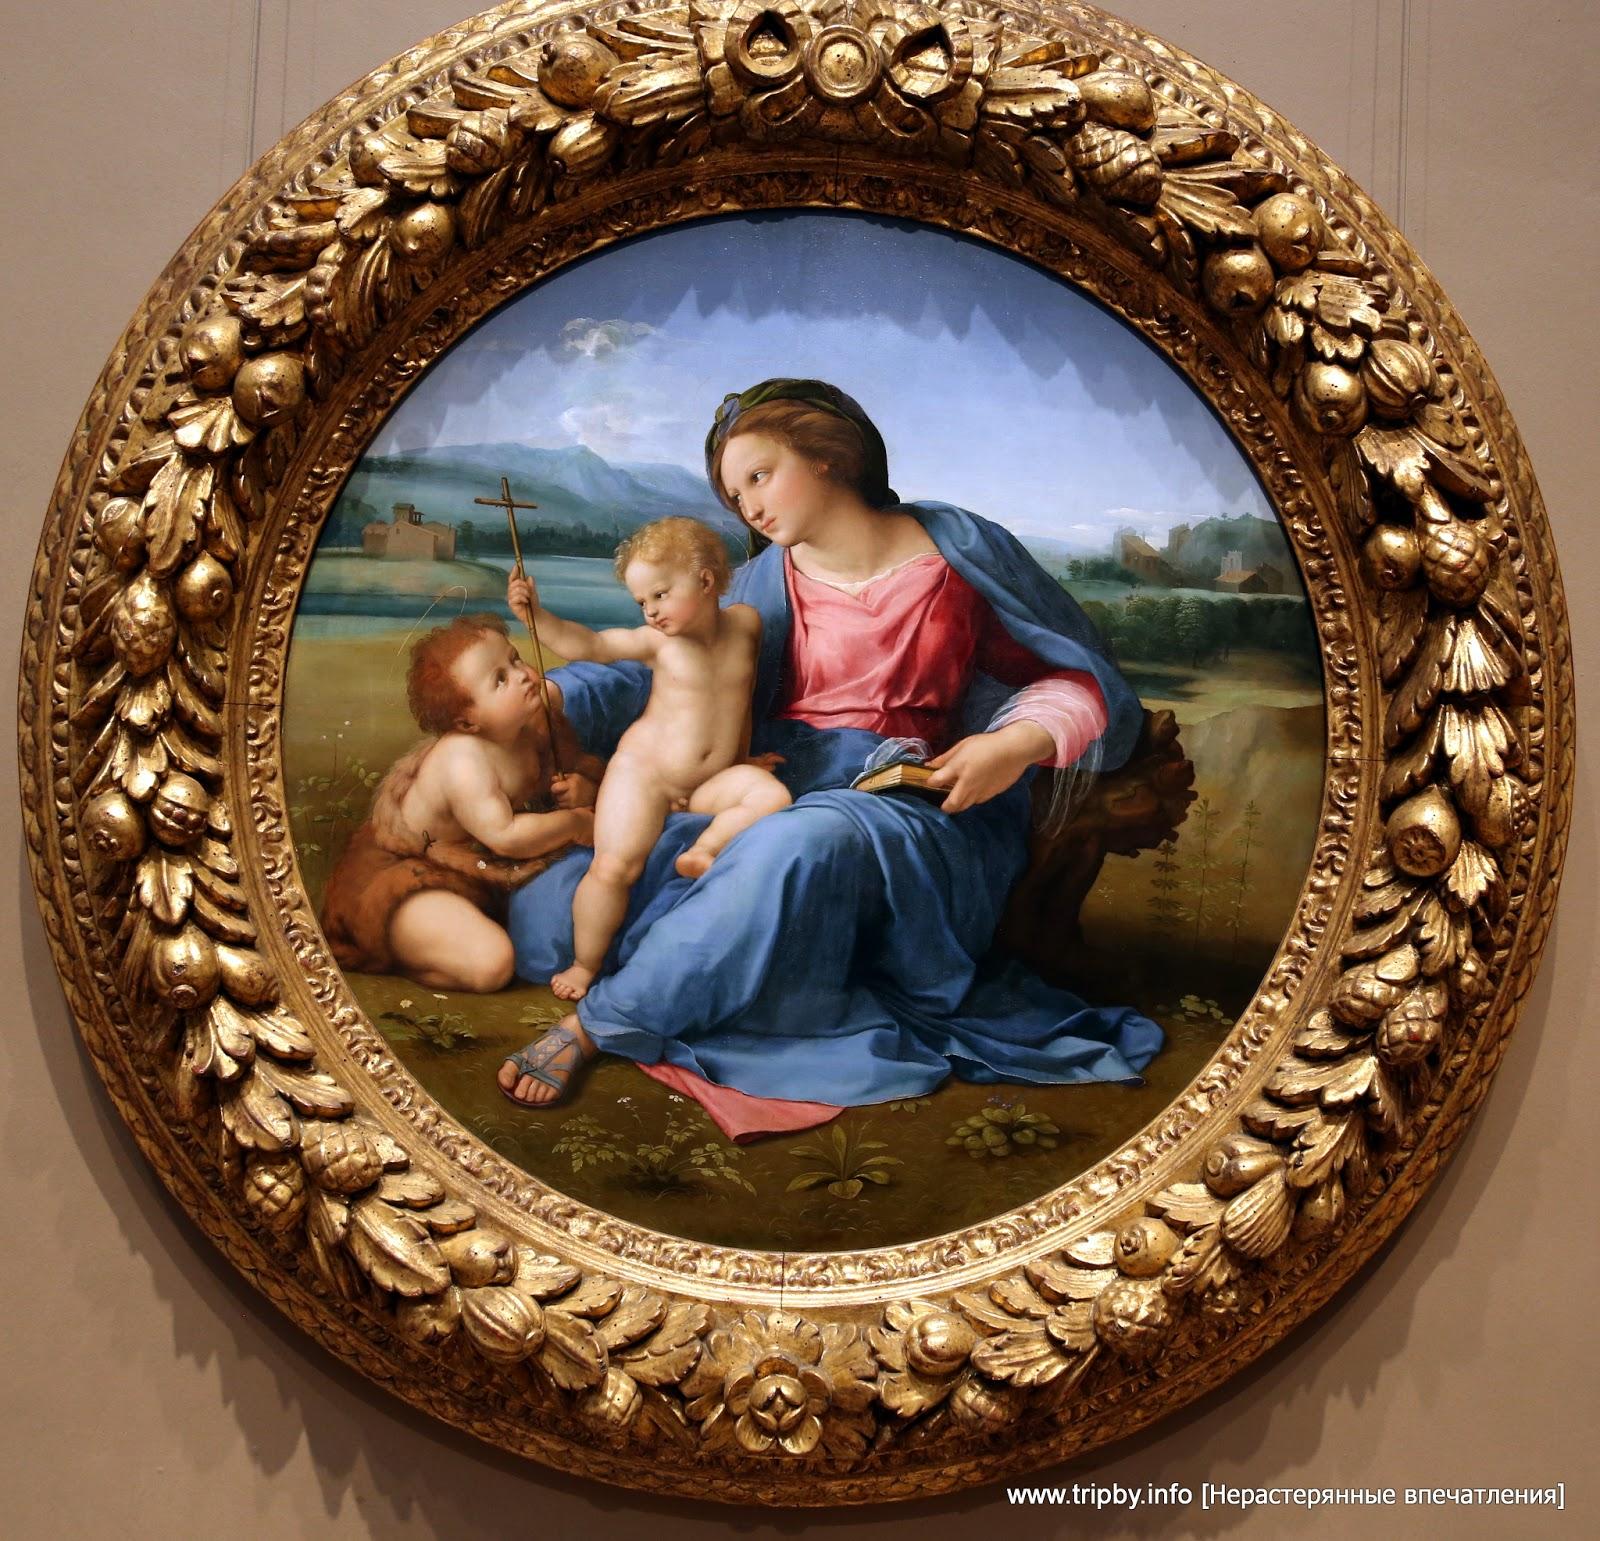 Raphael Marchigian, 1483 - 1520 The Alba Madonna c. 1510